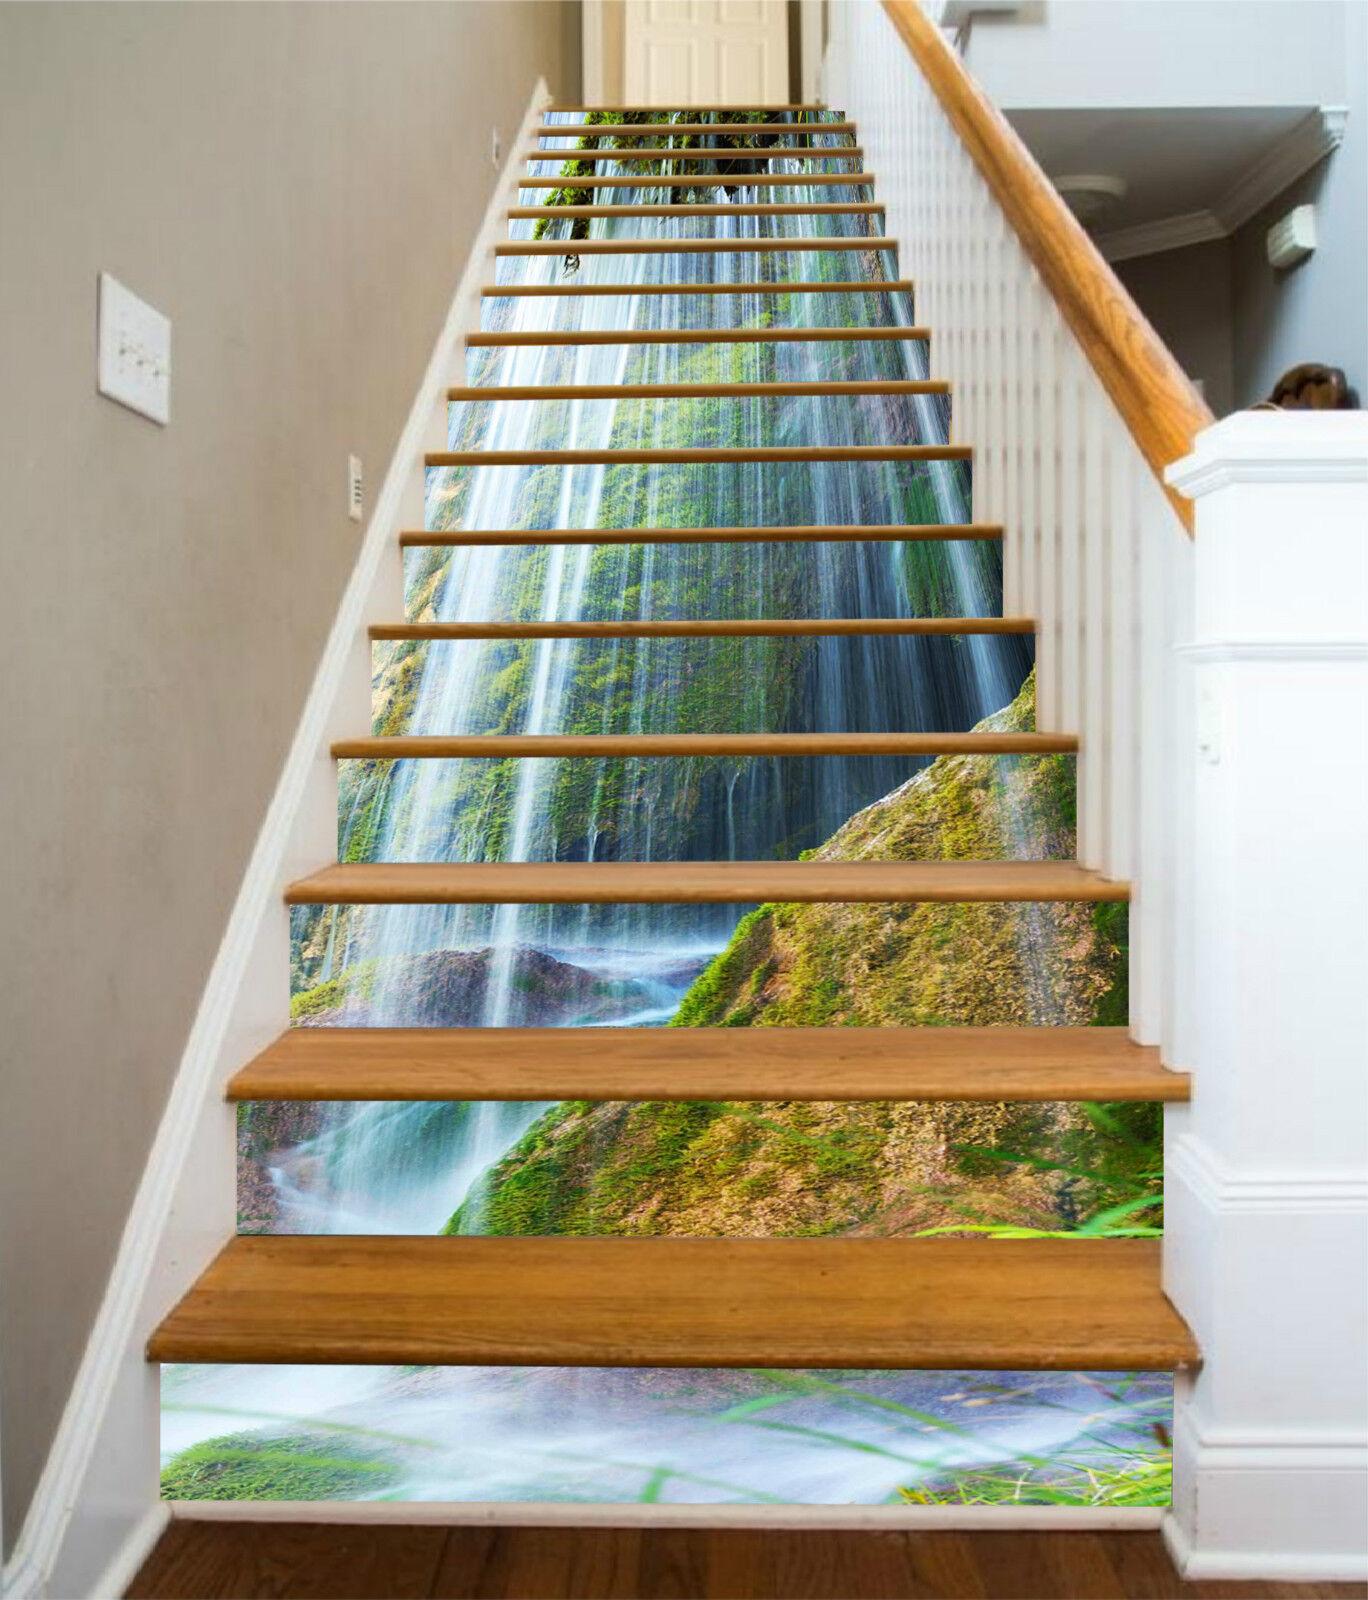 3D Wasserfall 237 Stair Risers Dekoration Fototapete Vinyl Aufkleber Tapete DE